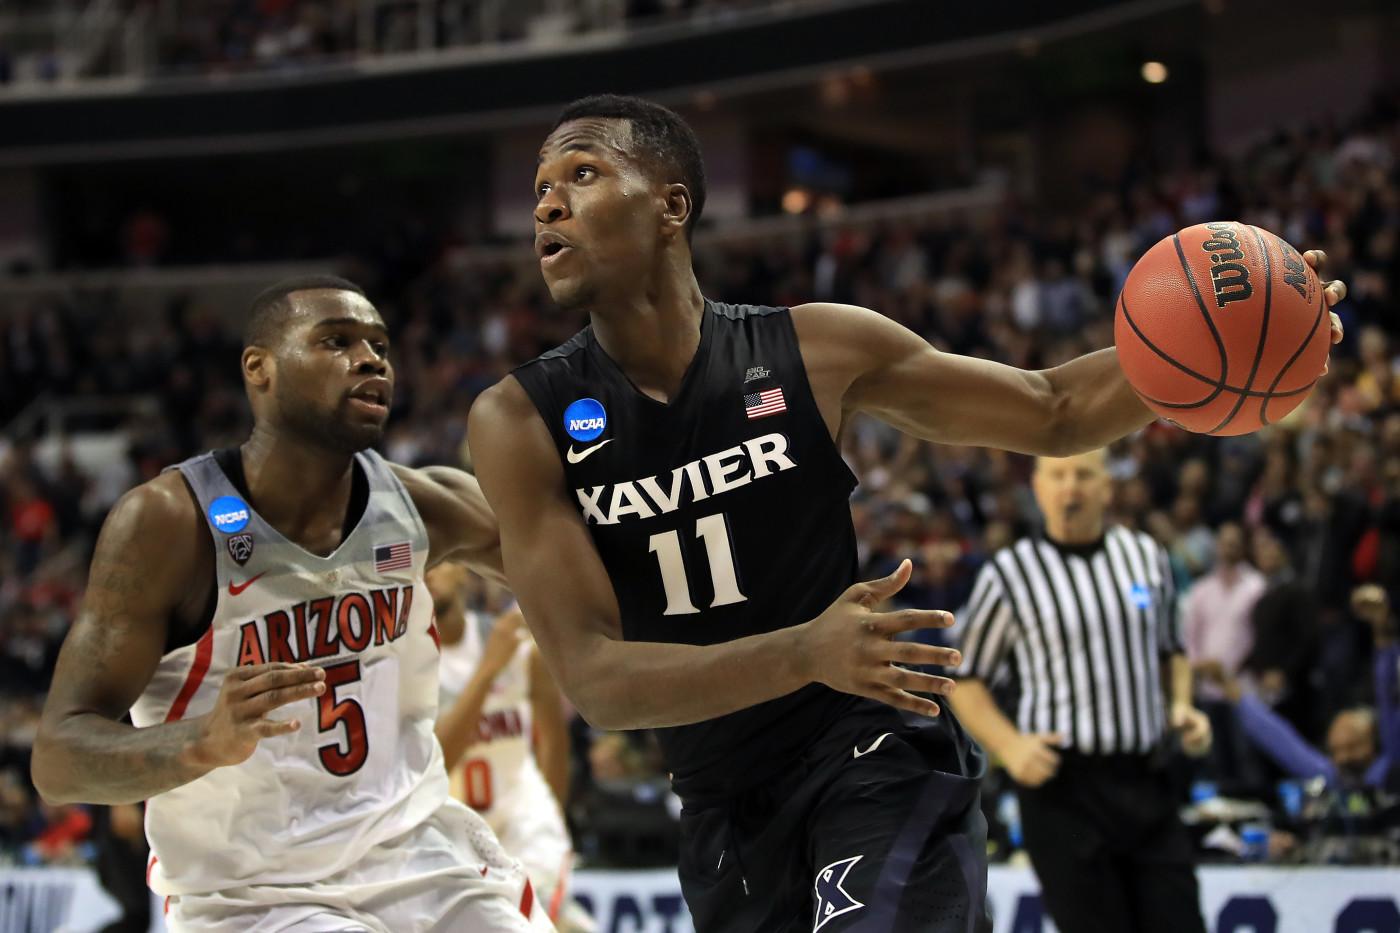 Malcolm Bernard avoids Arizona player during 2017 NCAA tournament game